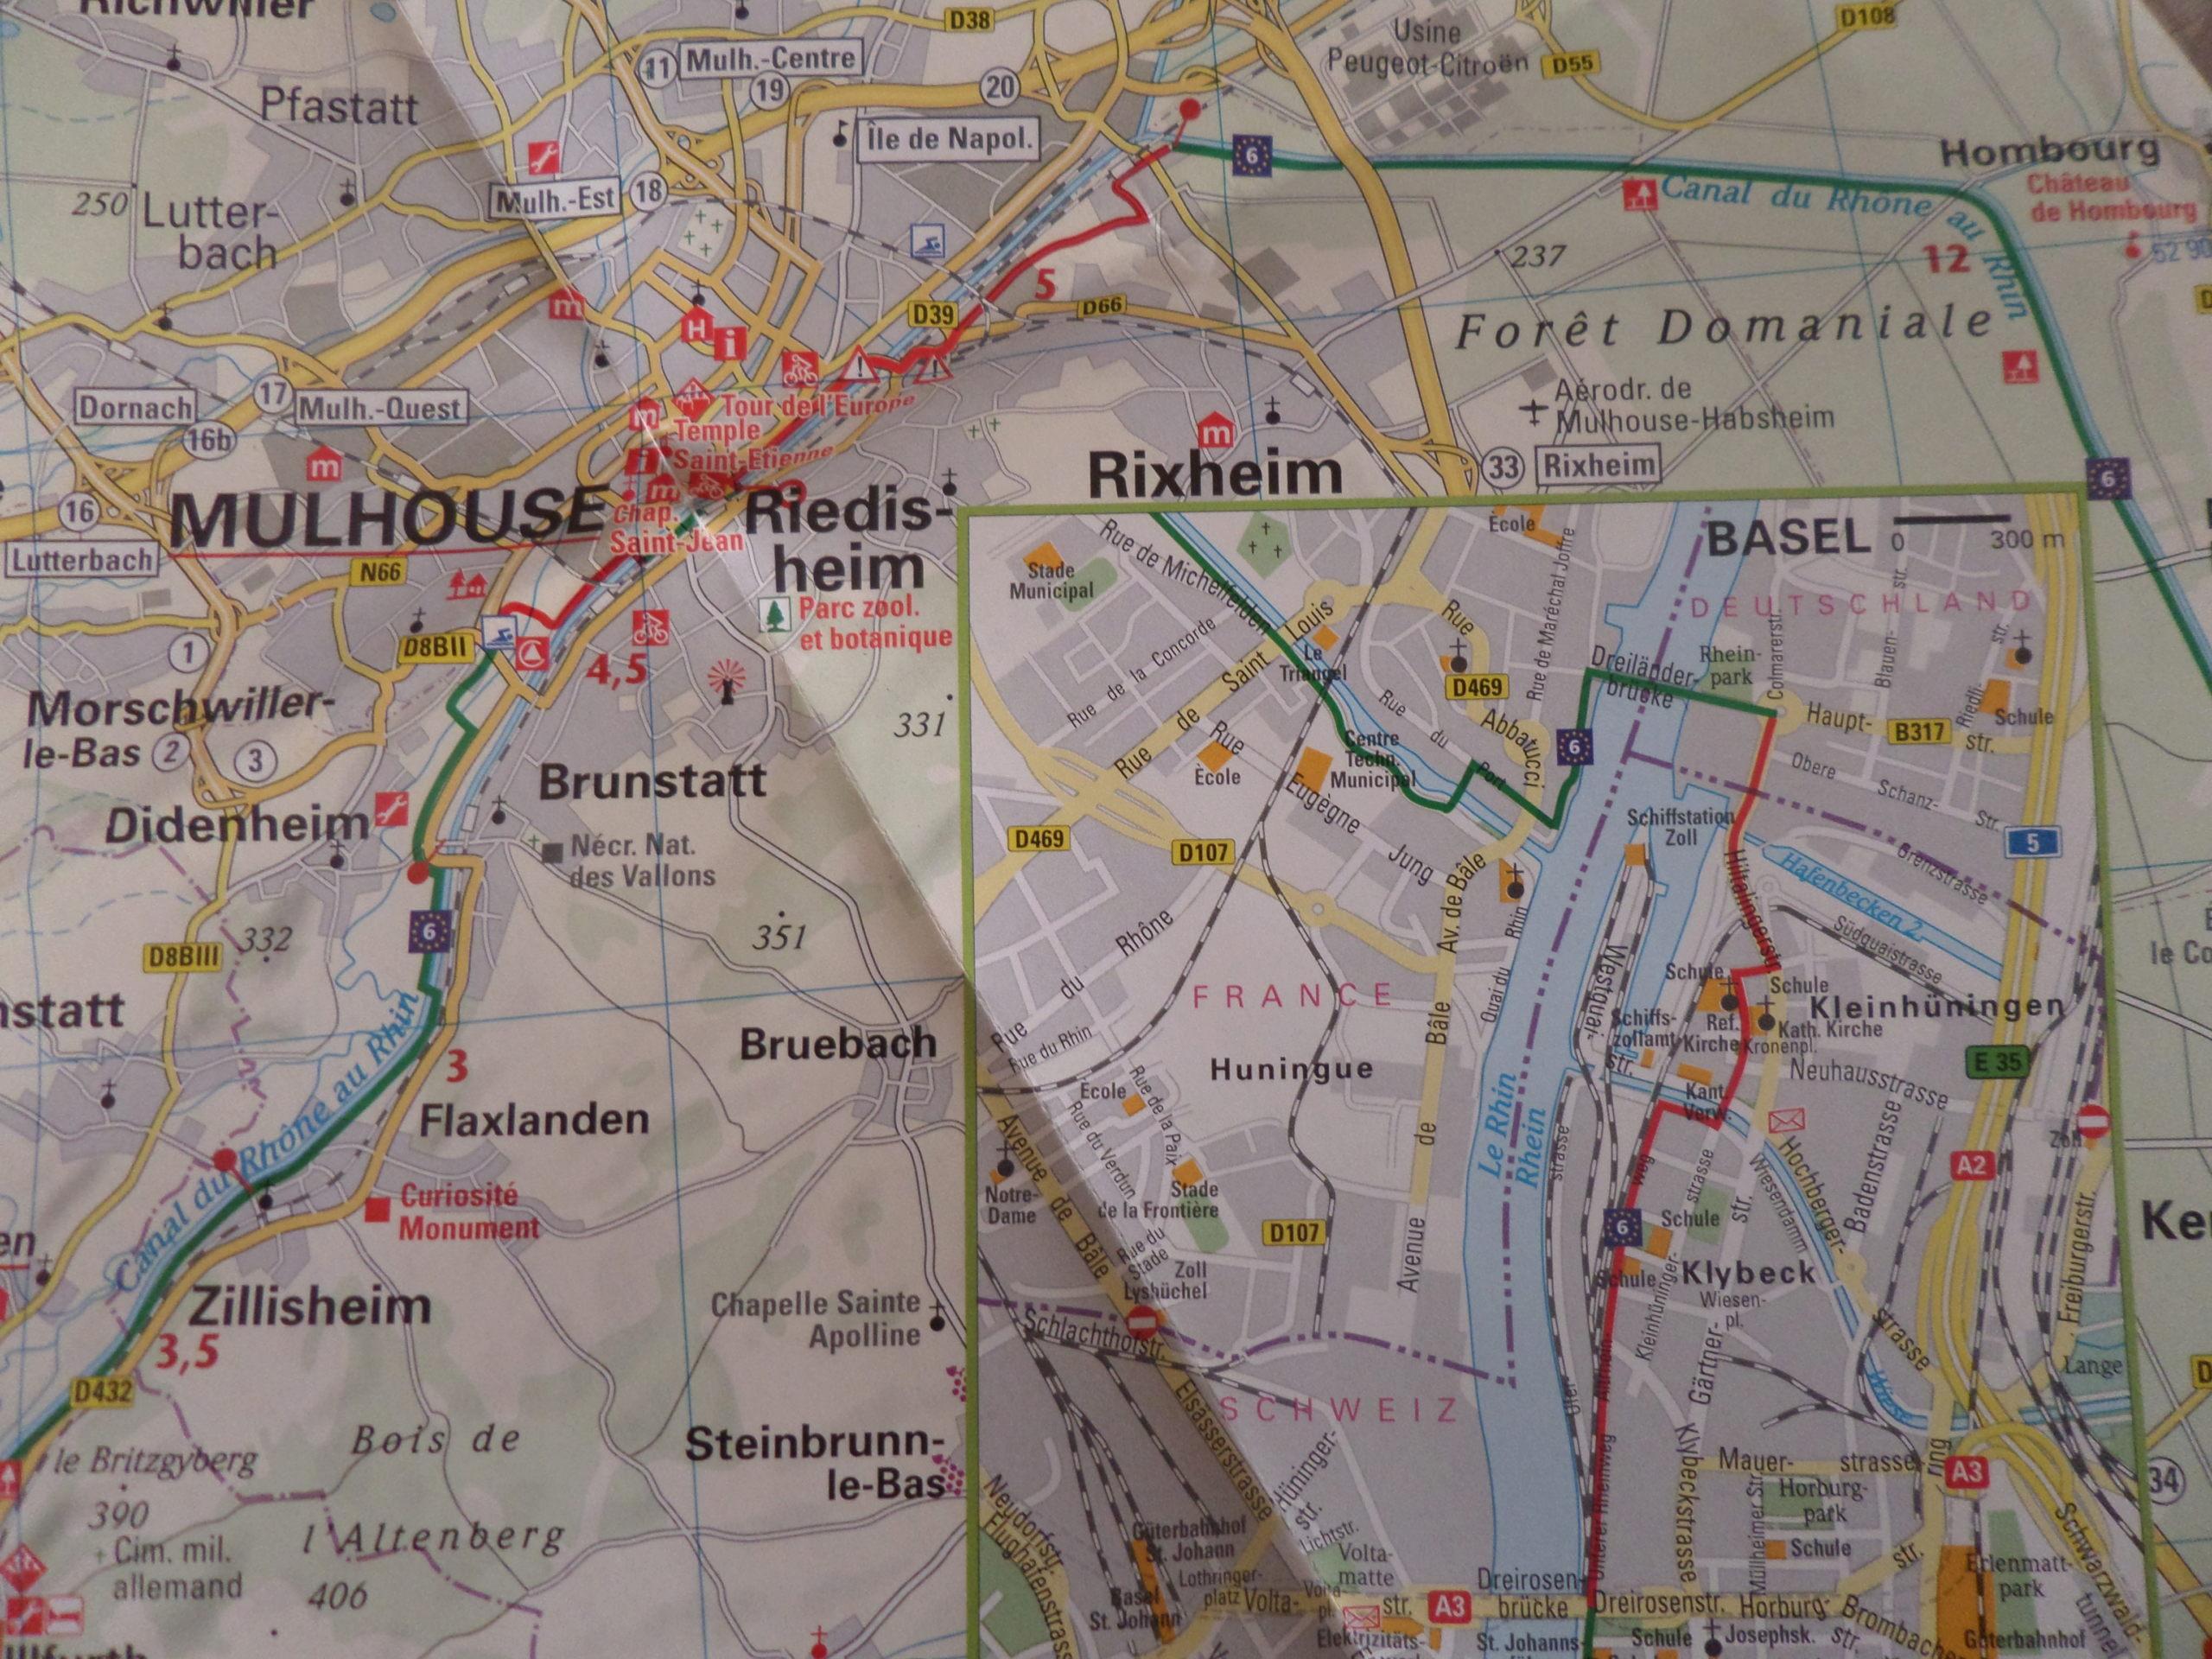 EuroVélo 6 Mulhouse - Budapest [12 mai au 3 juin 2019] saison 14 •Bƒ   Sam_8610